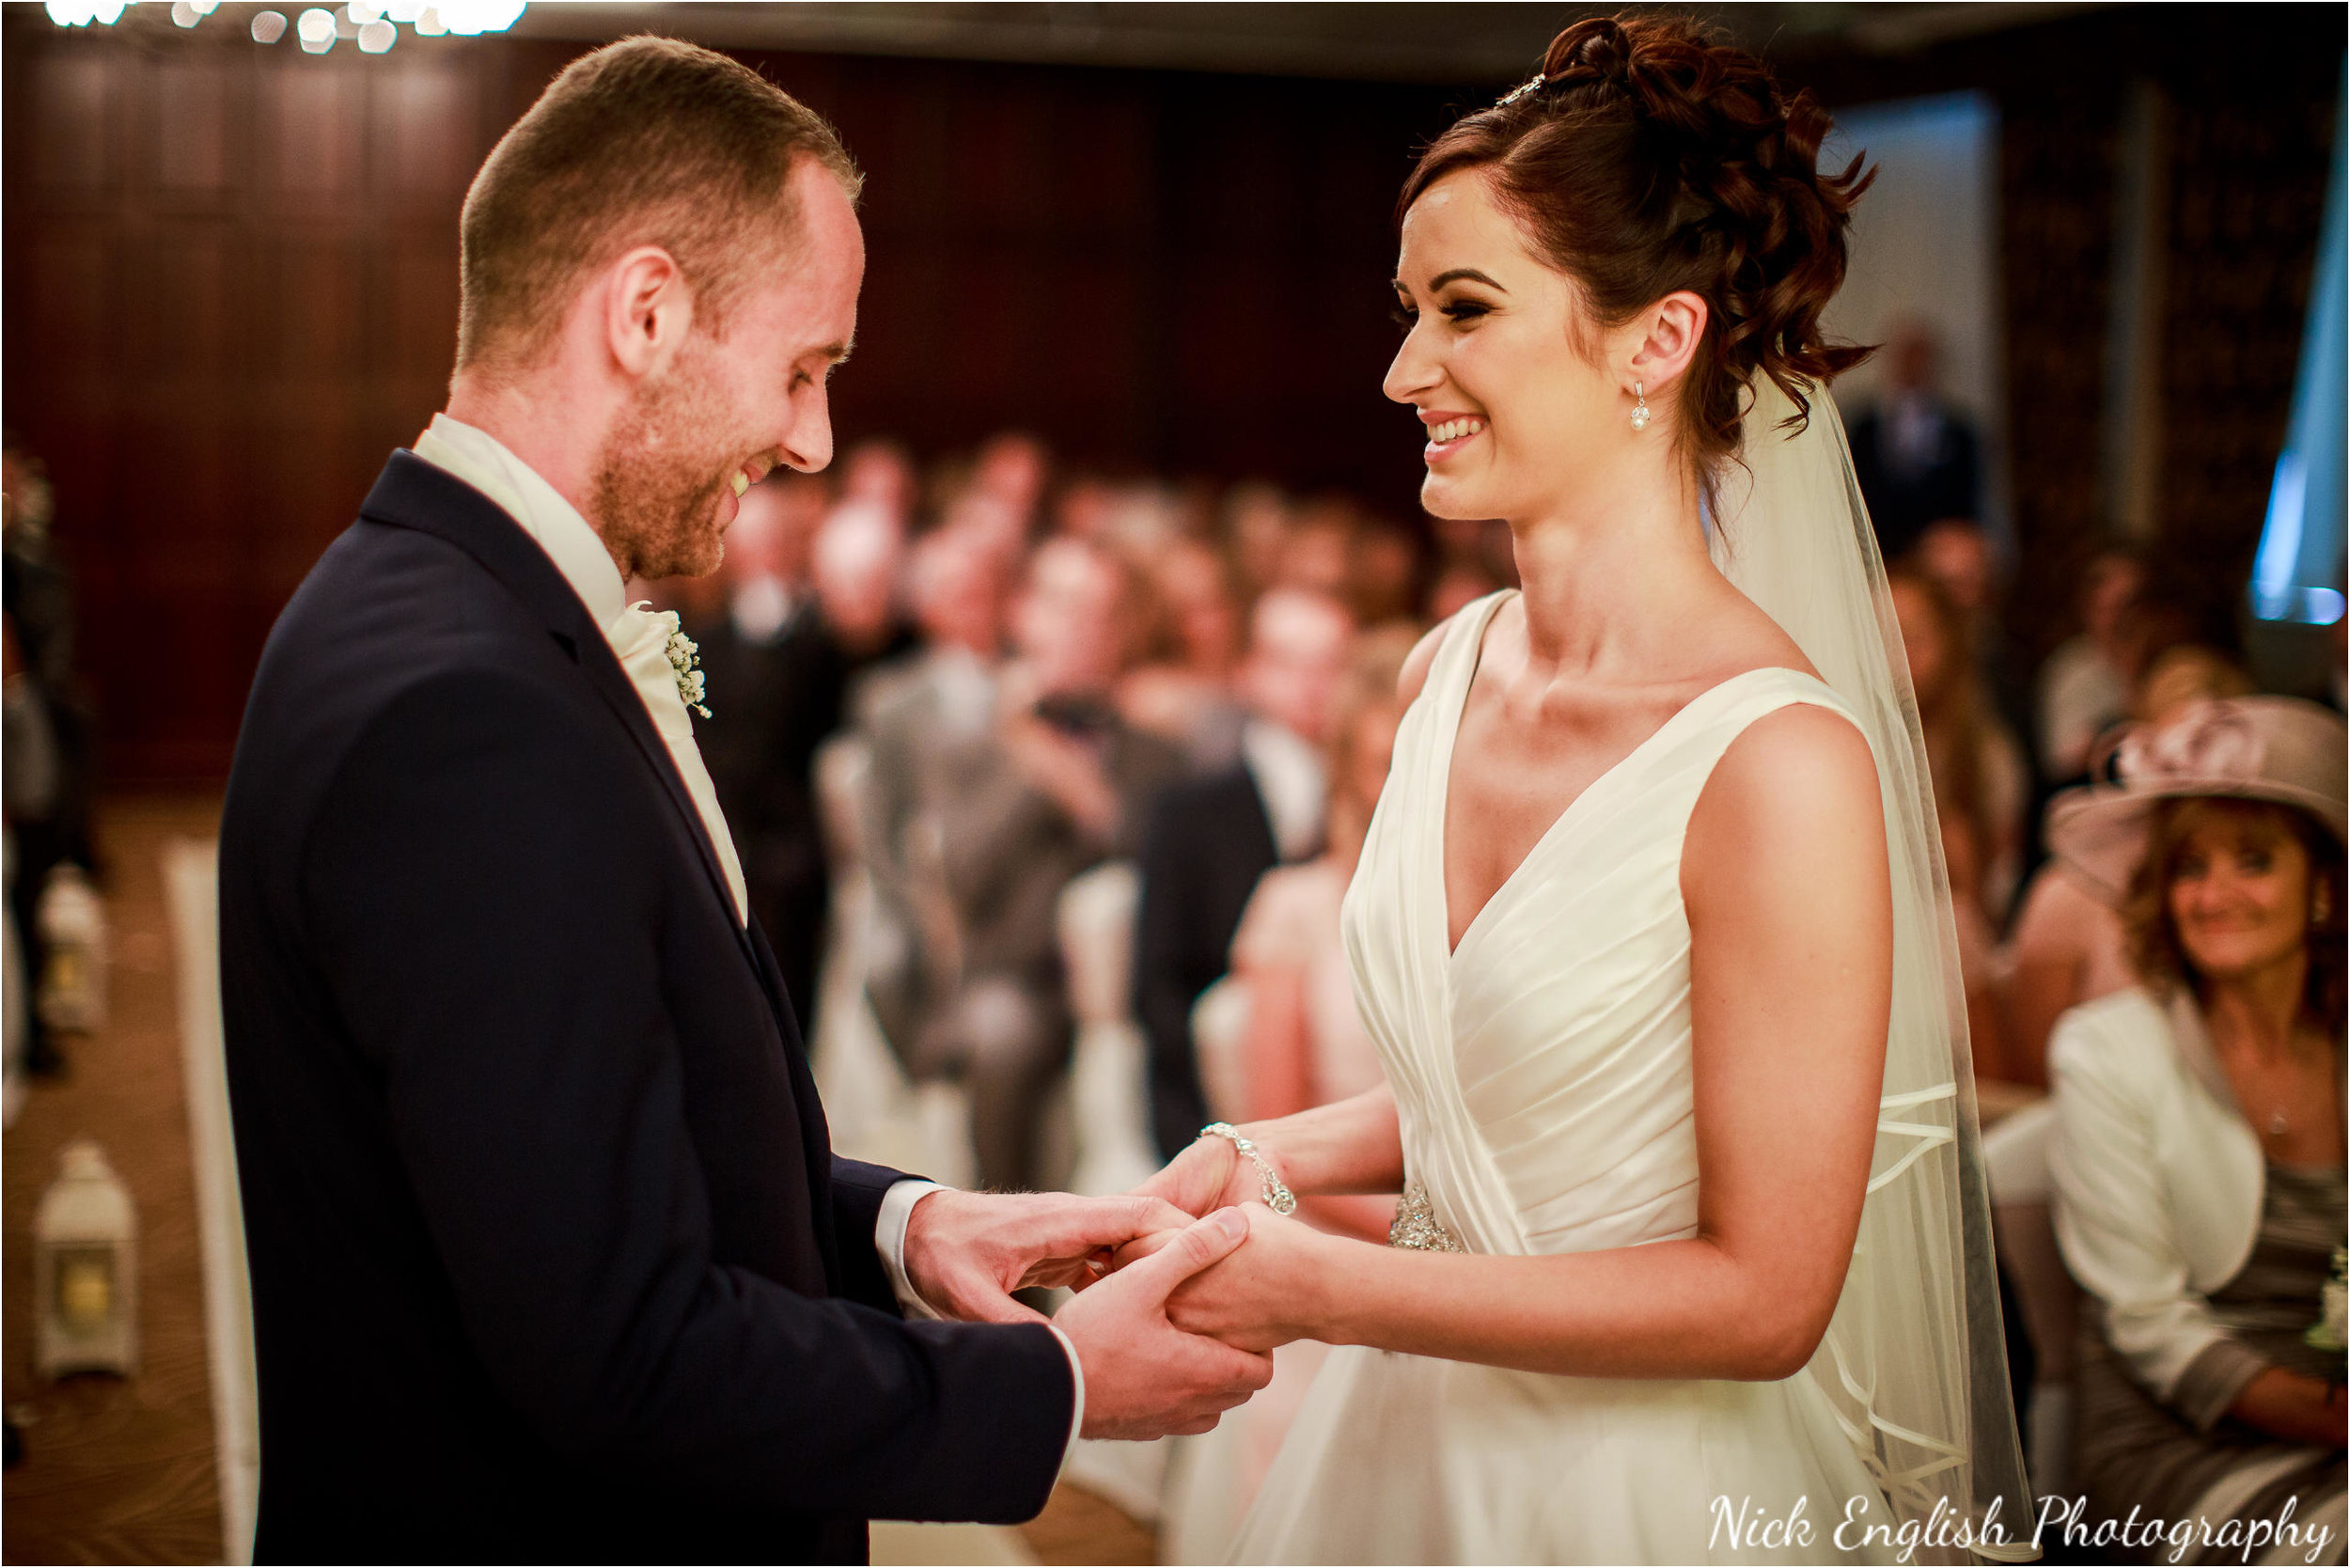 Emily David Wedding Photographs at Barton Grange Preston by Nick English Photography 75jpg.jpeg